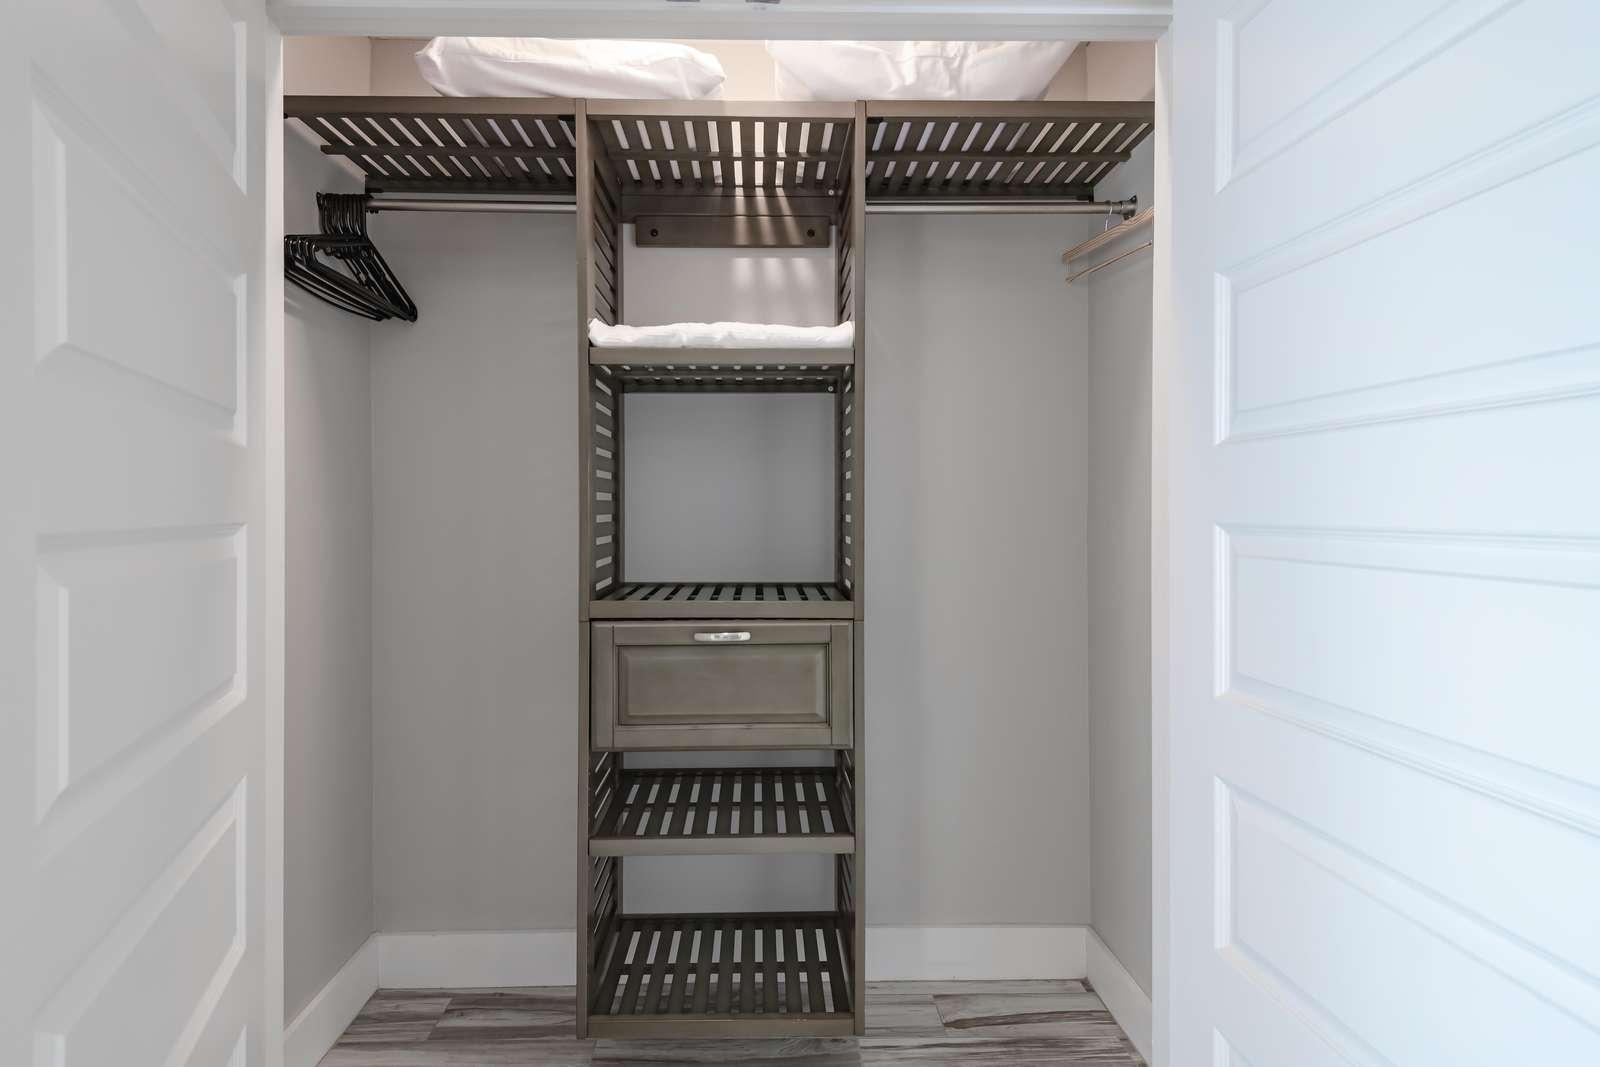 Built in closet shelving!